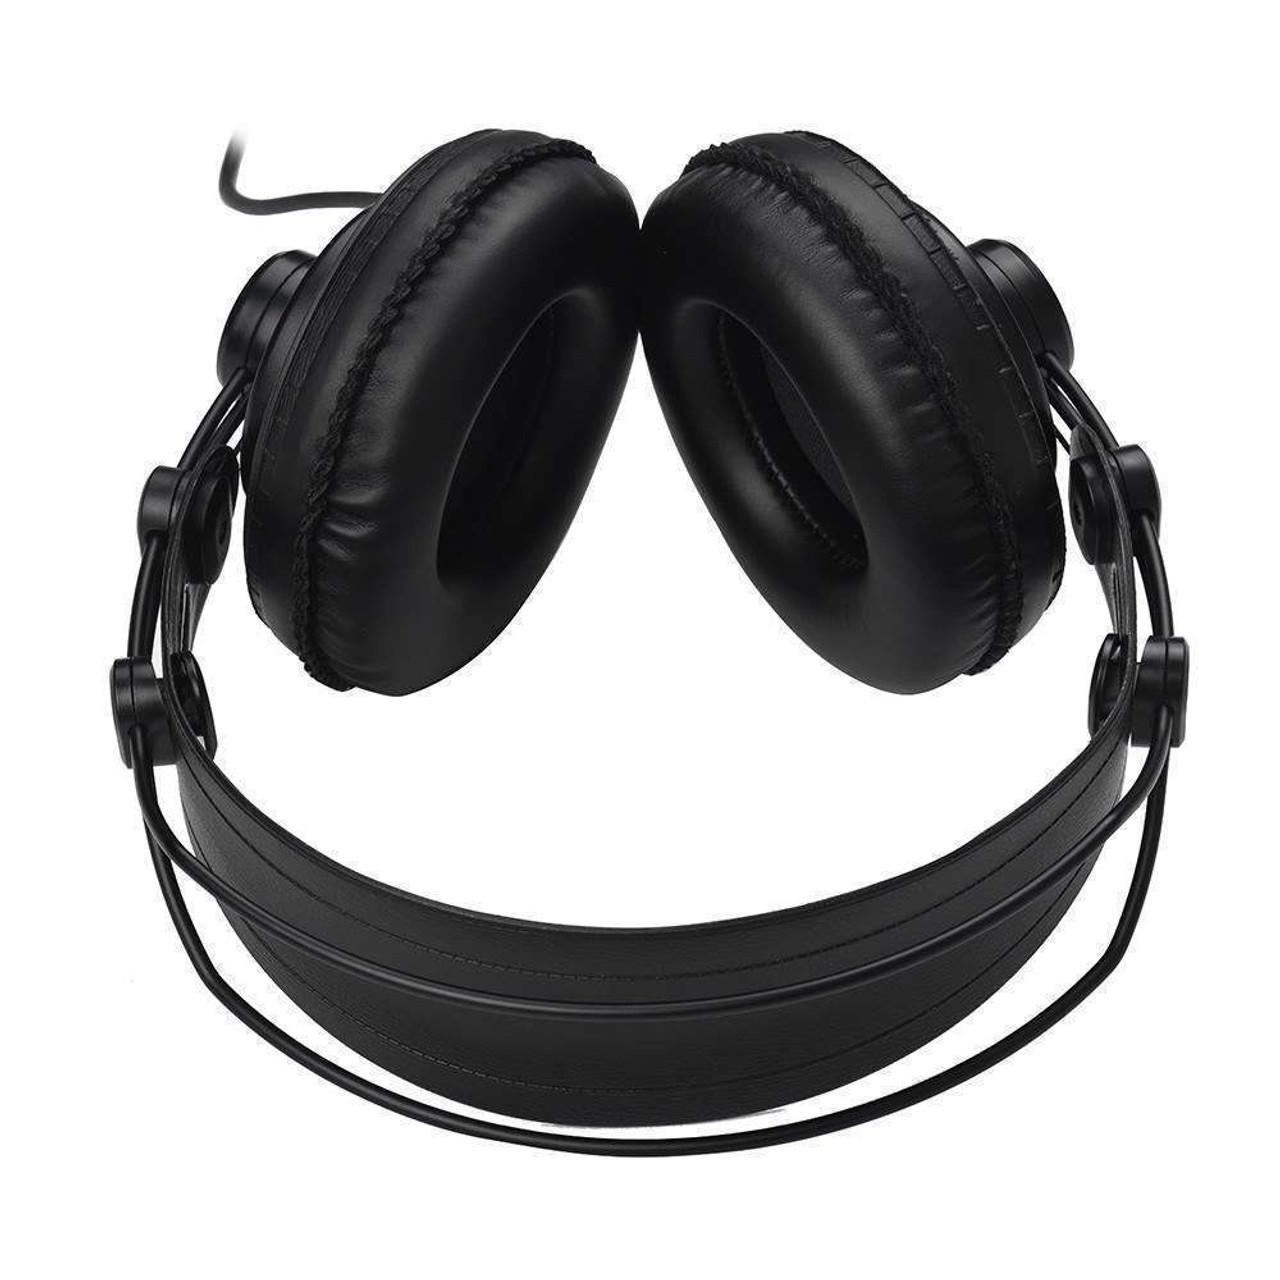 SAMSON SR850 Professional Studio Headphones For DJ & Gaming